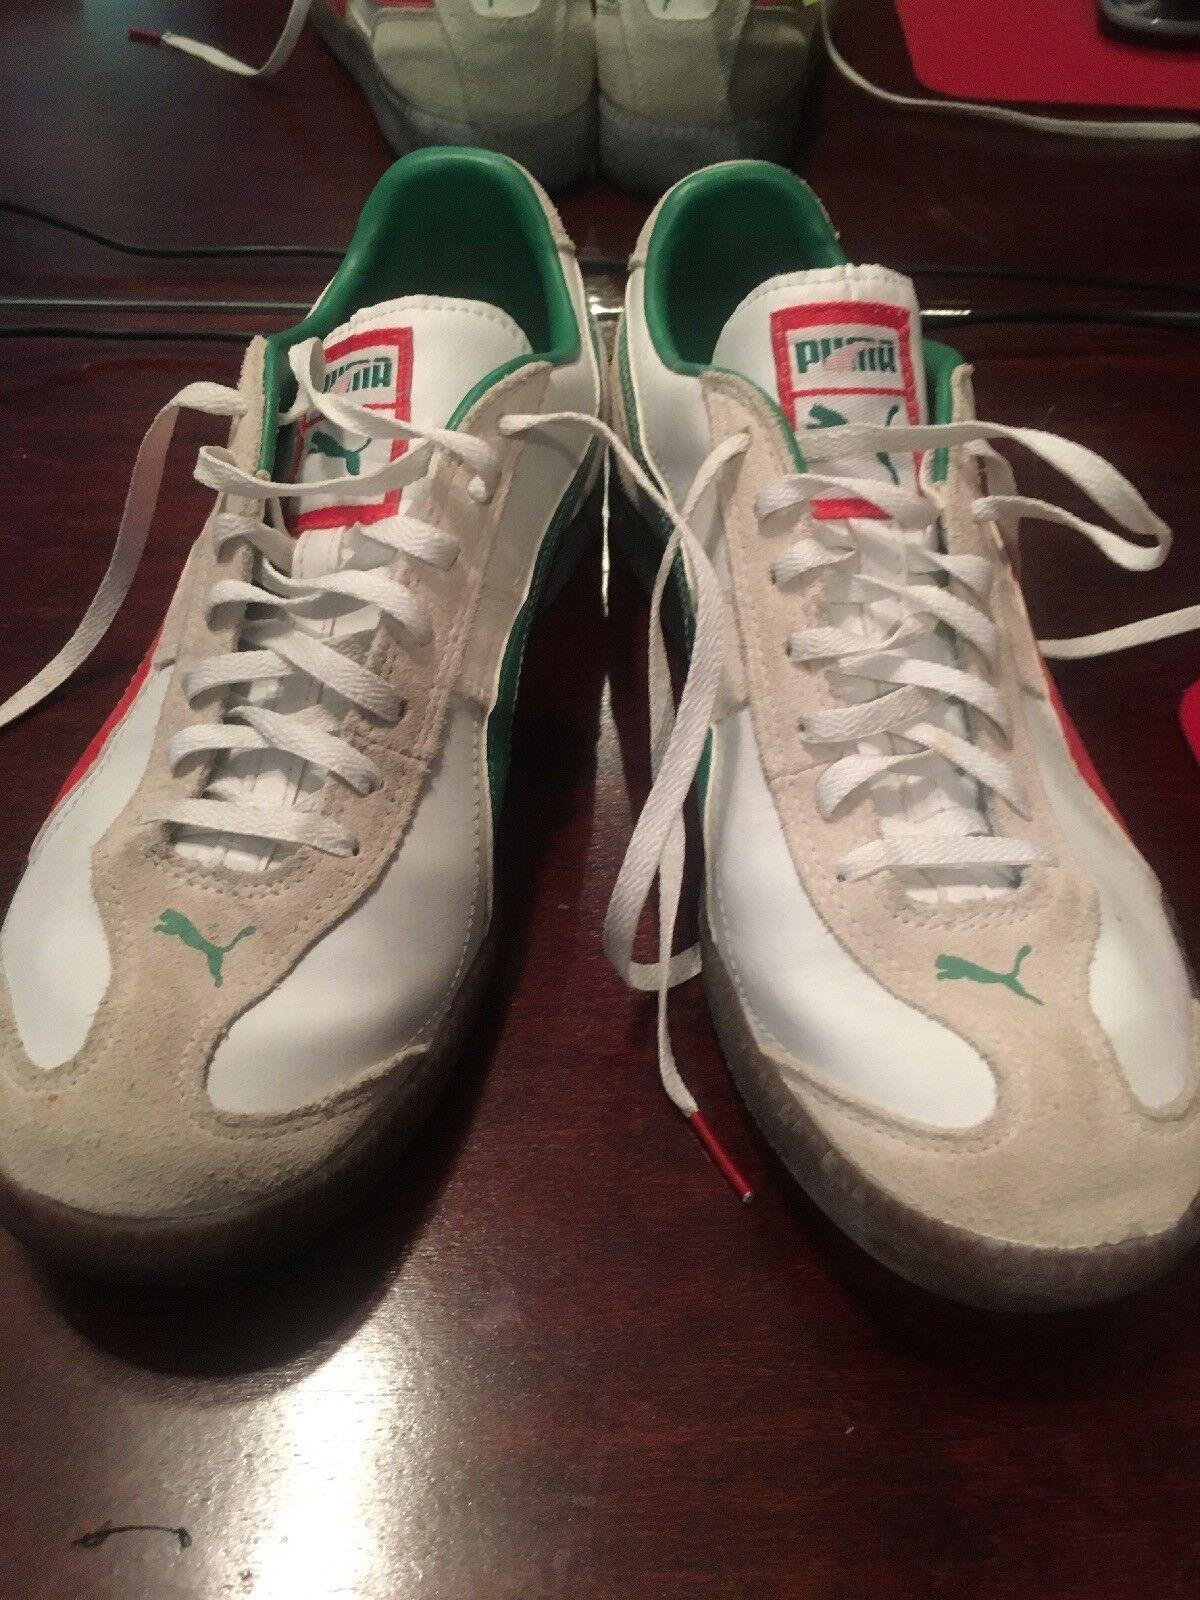 Puma Indoor Soccer Sneakers Size US 8.5